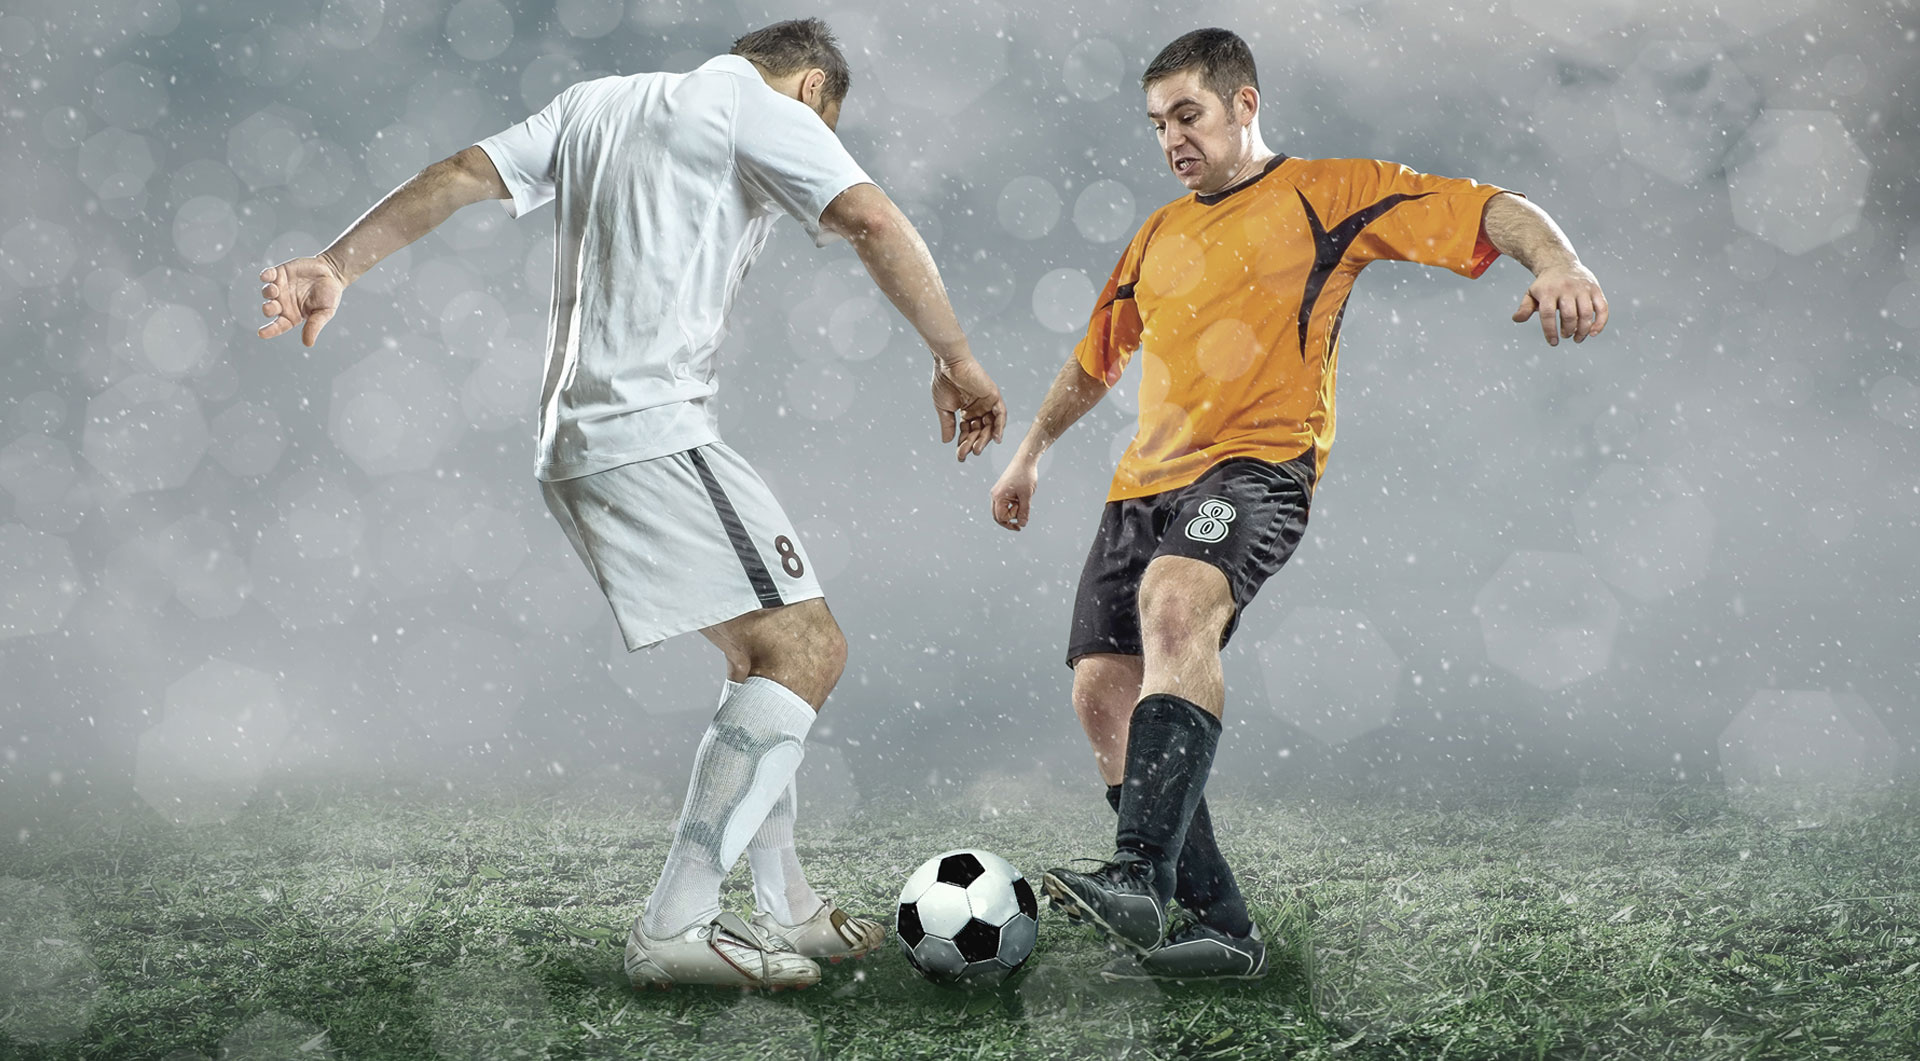 watch-stan-wawrinka-vs-thomaz-bellucci-2nd-round-us-open-2014-online